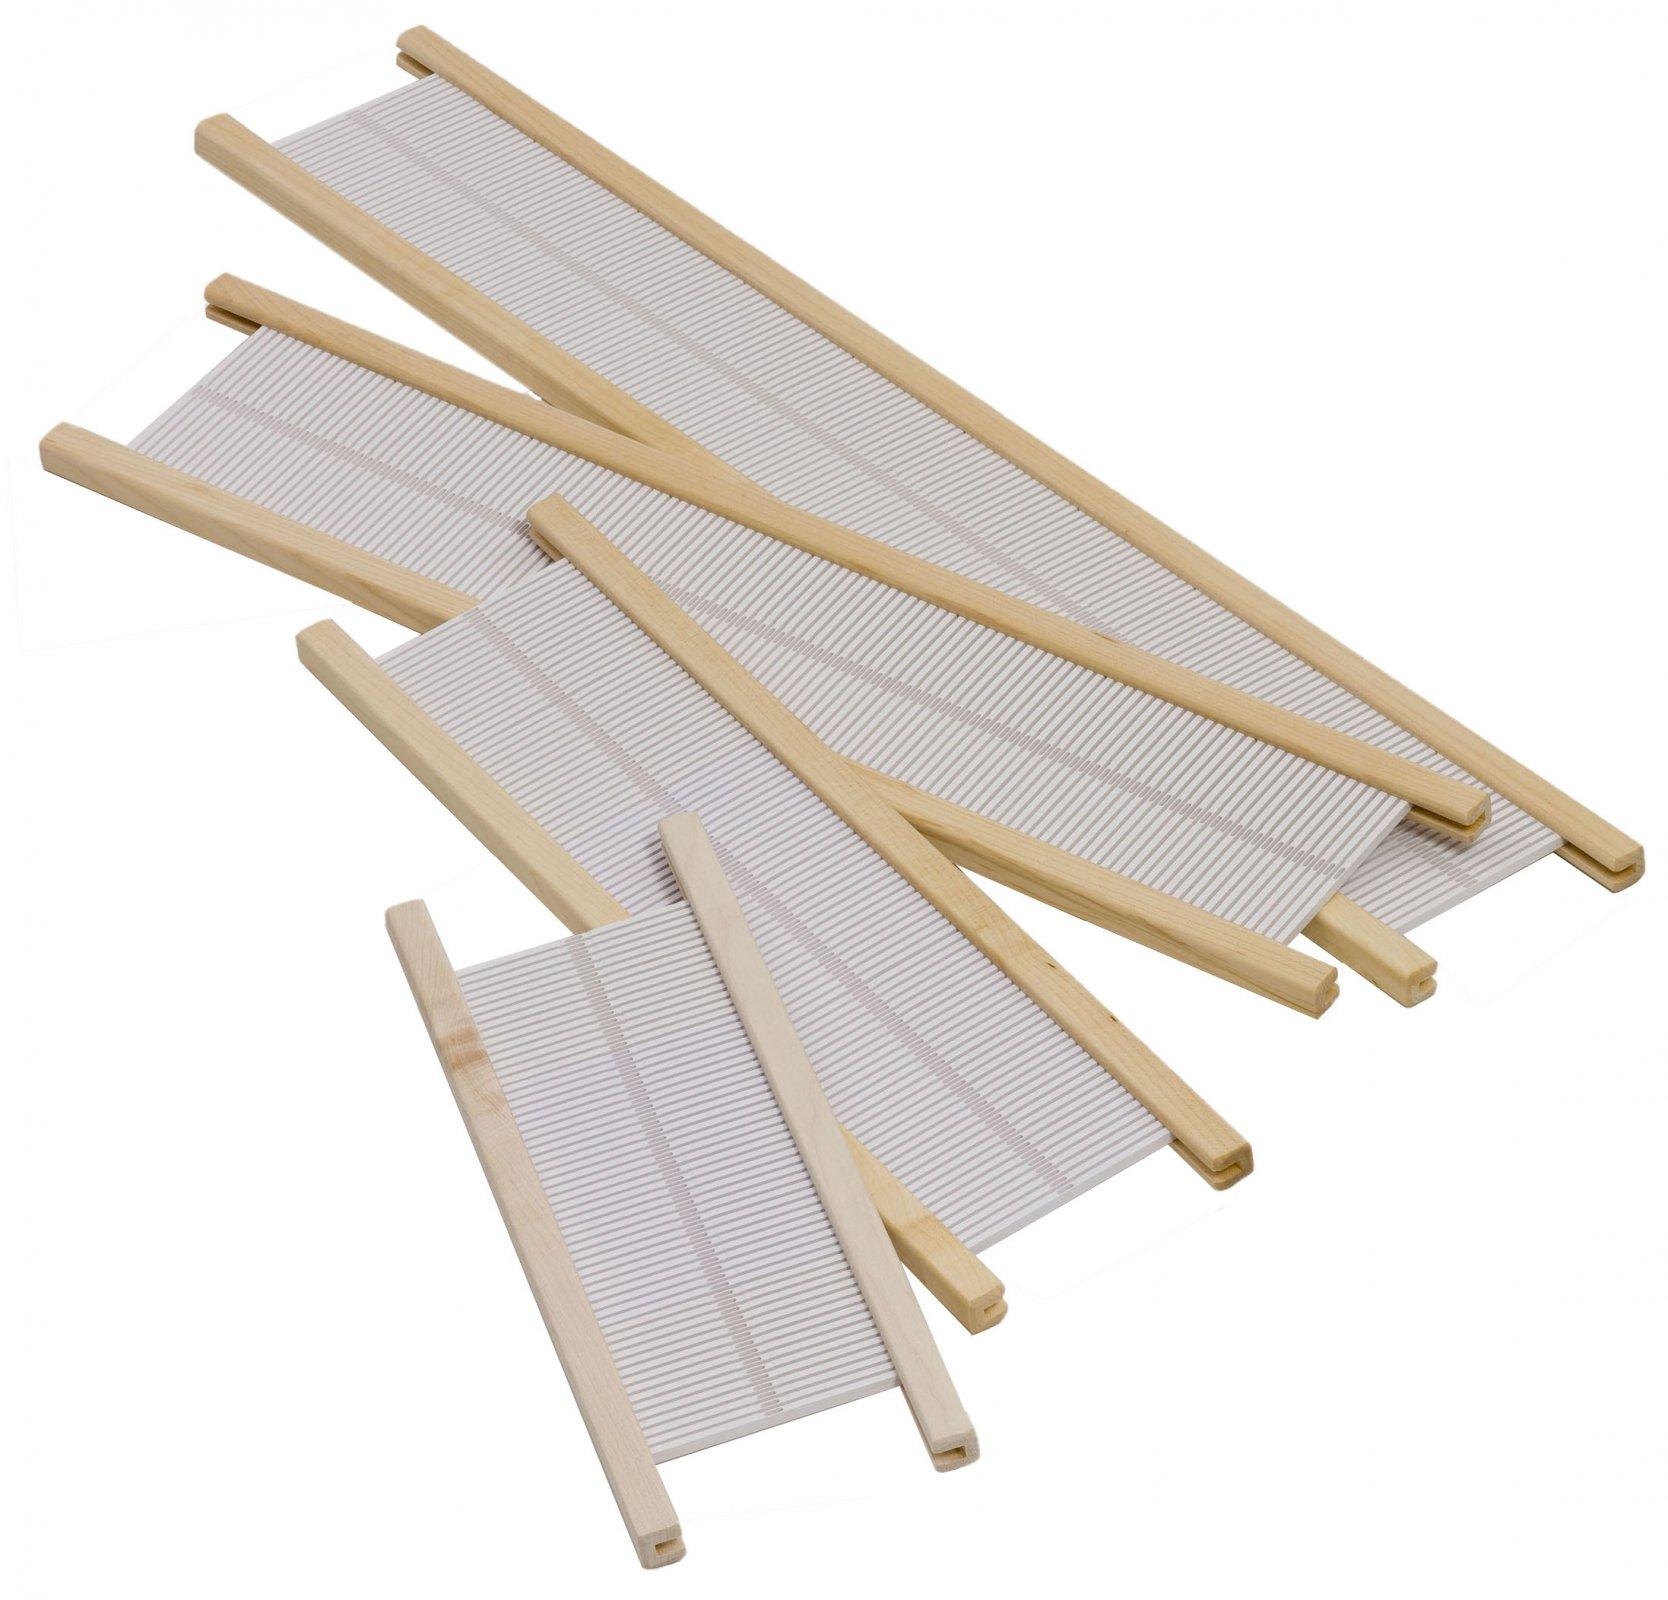 Cricket Reeds